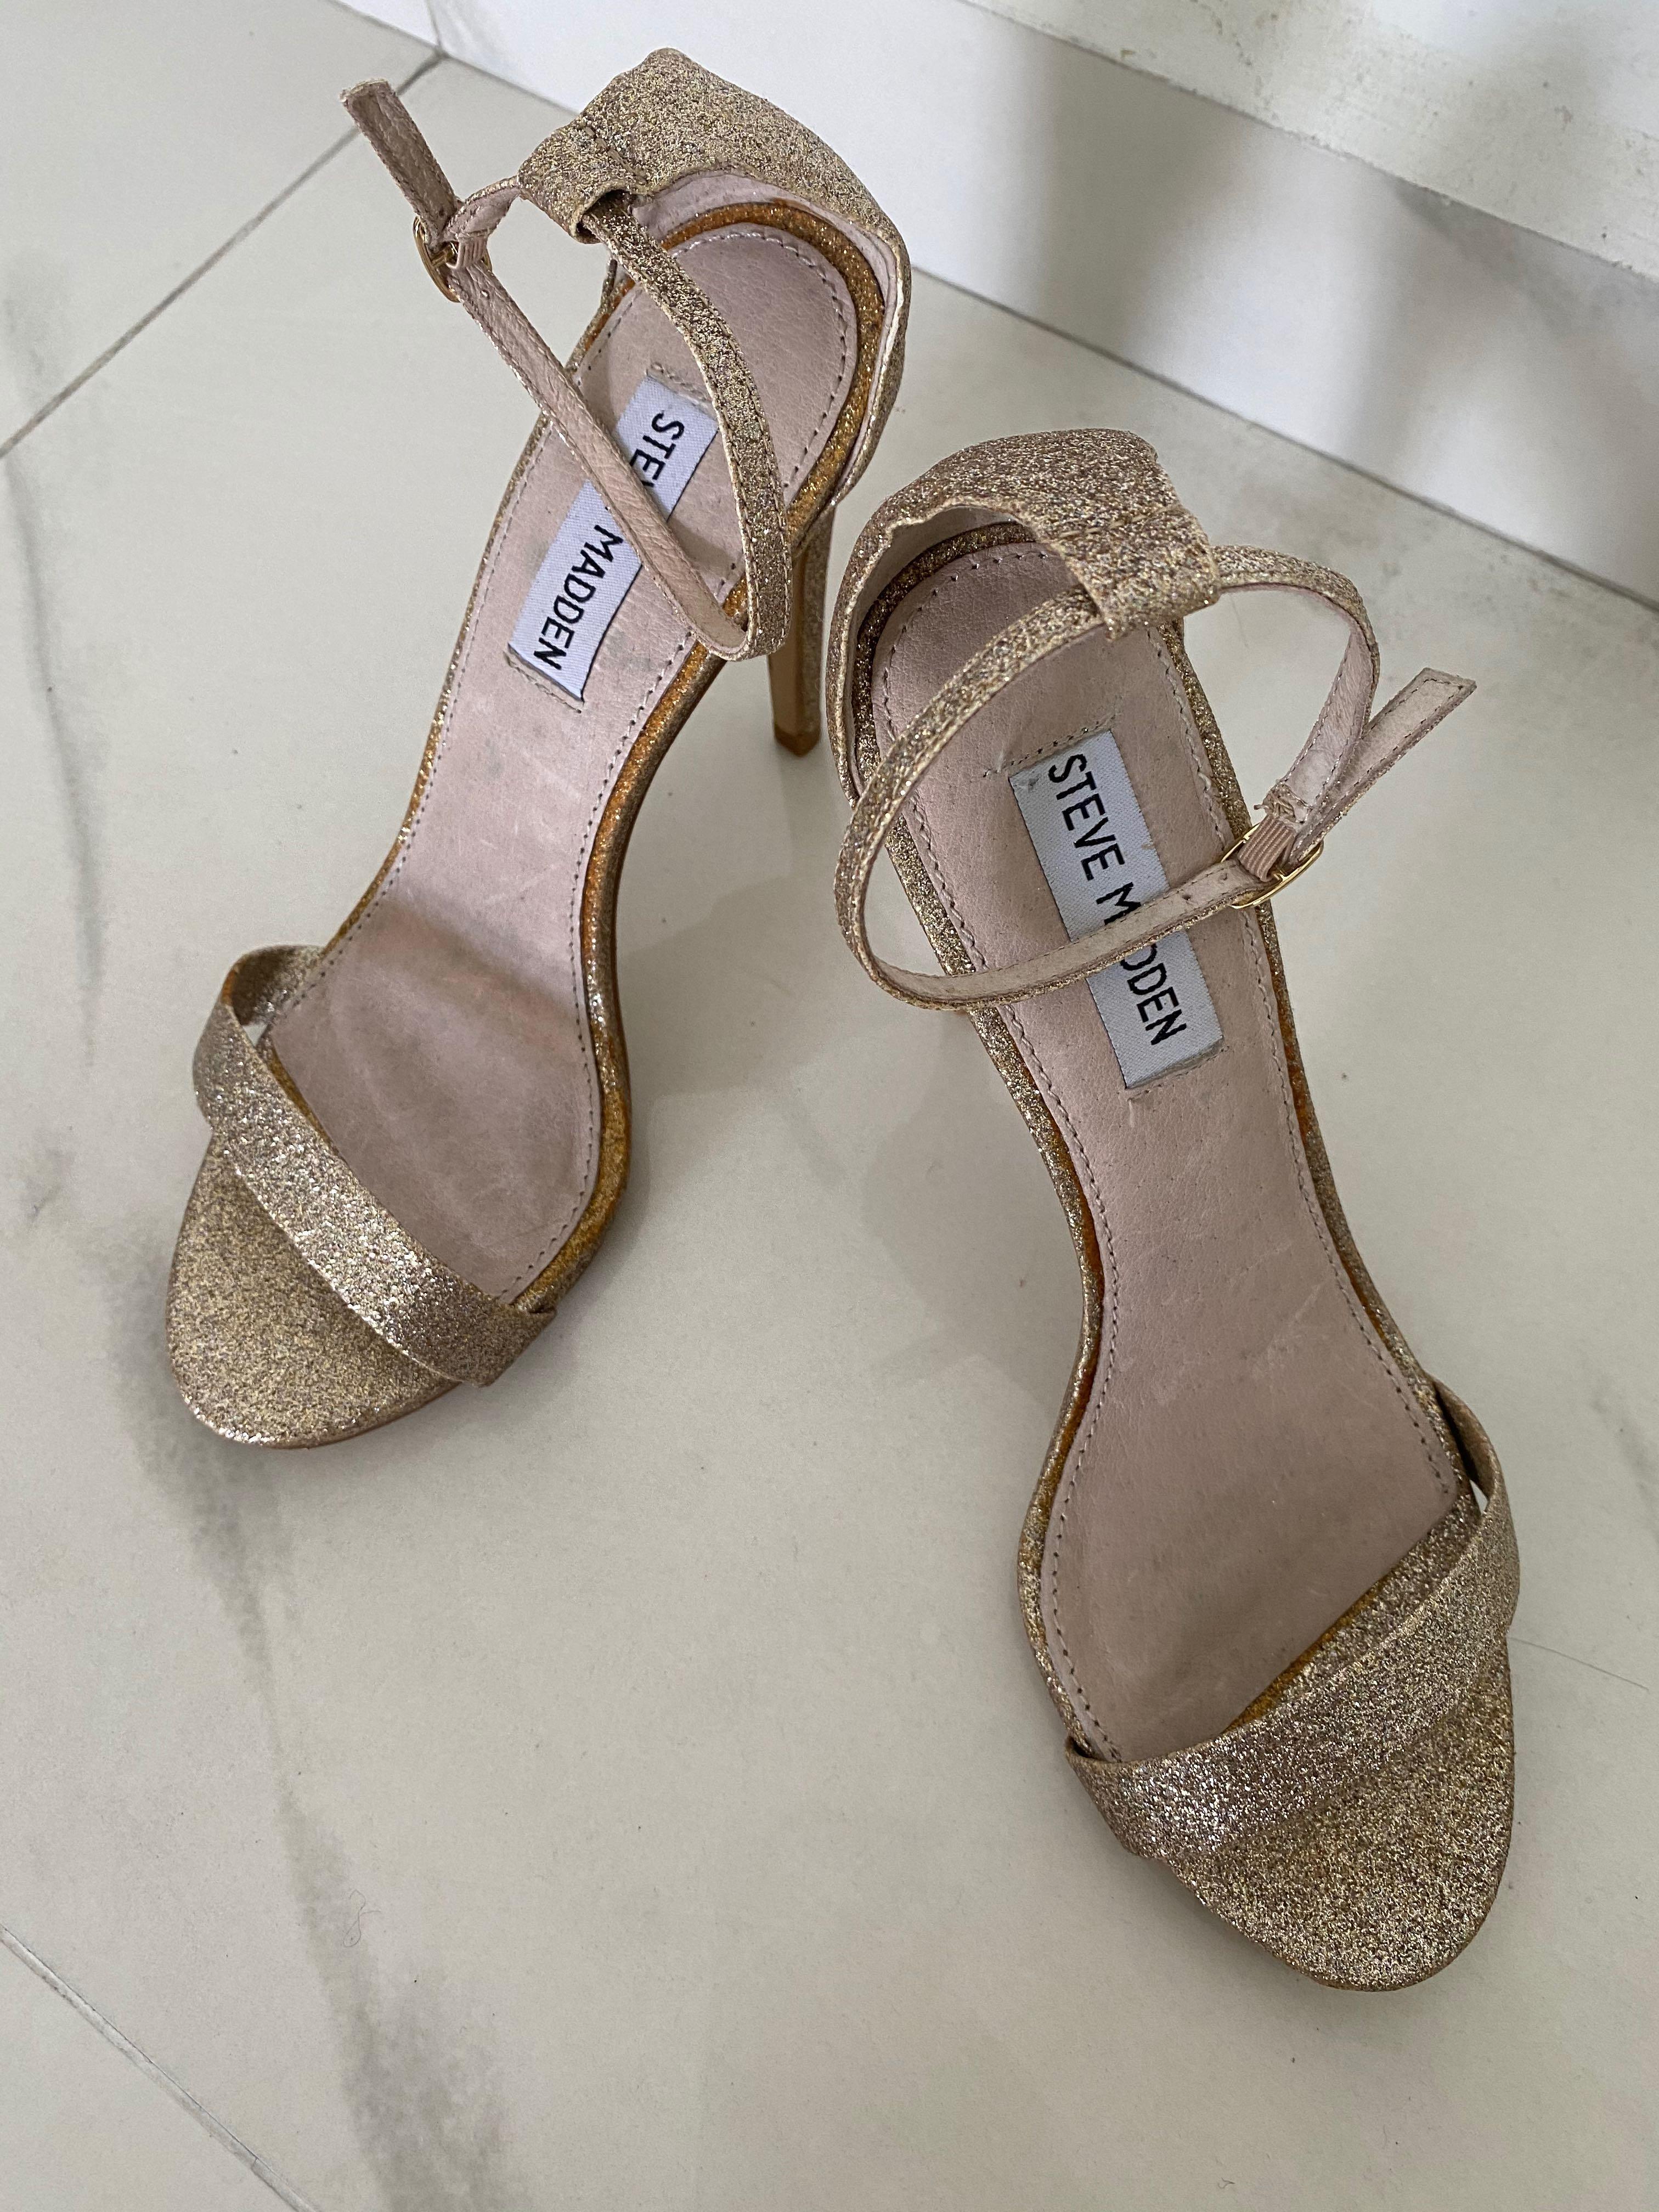 Steve Madden Gold Glitter Heels Size38